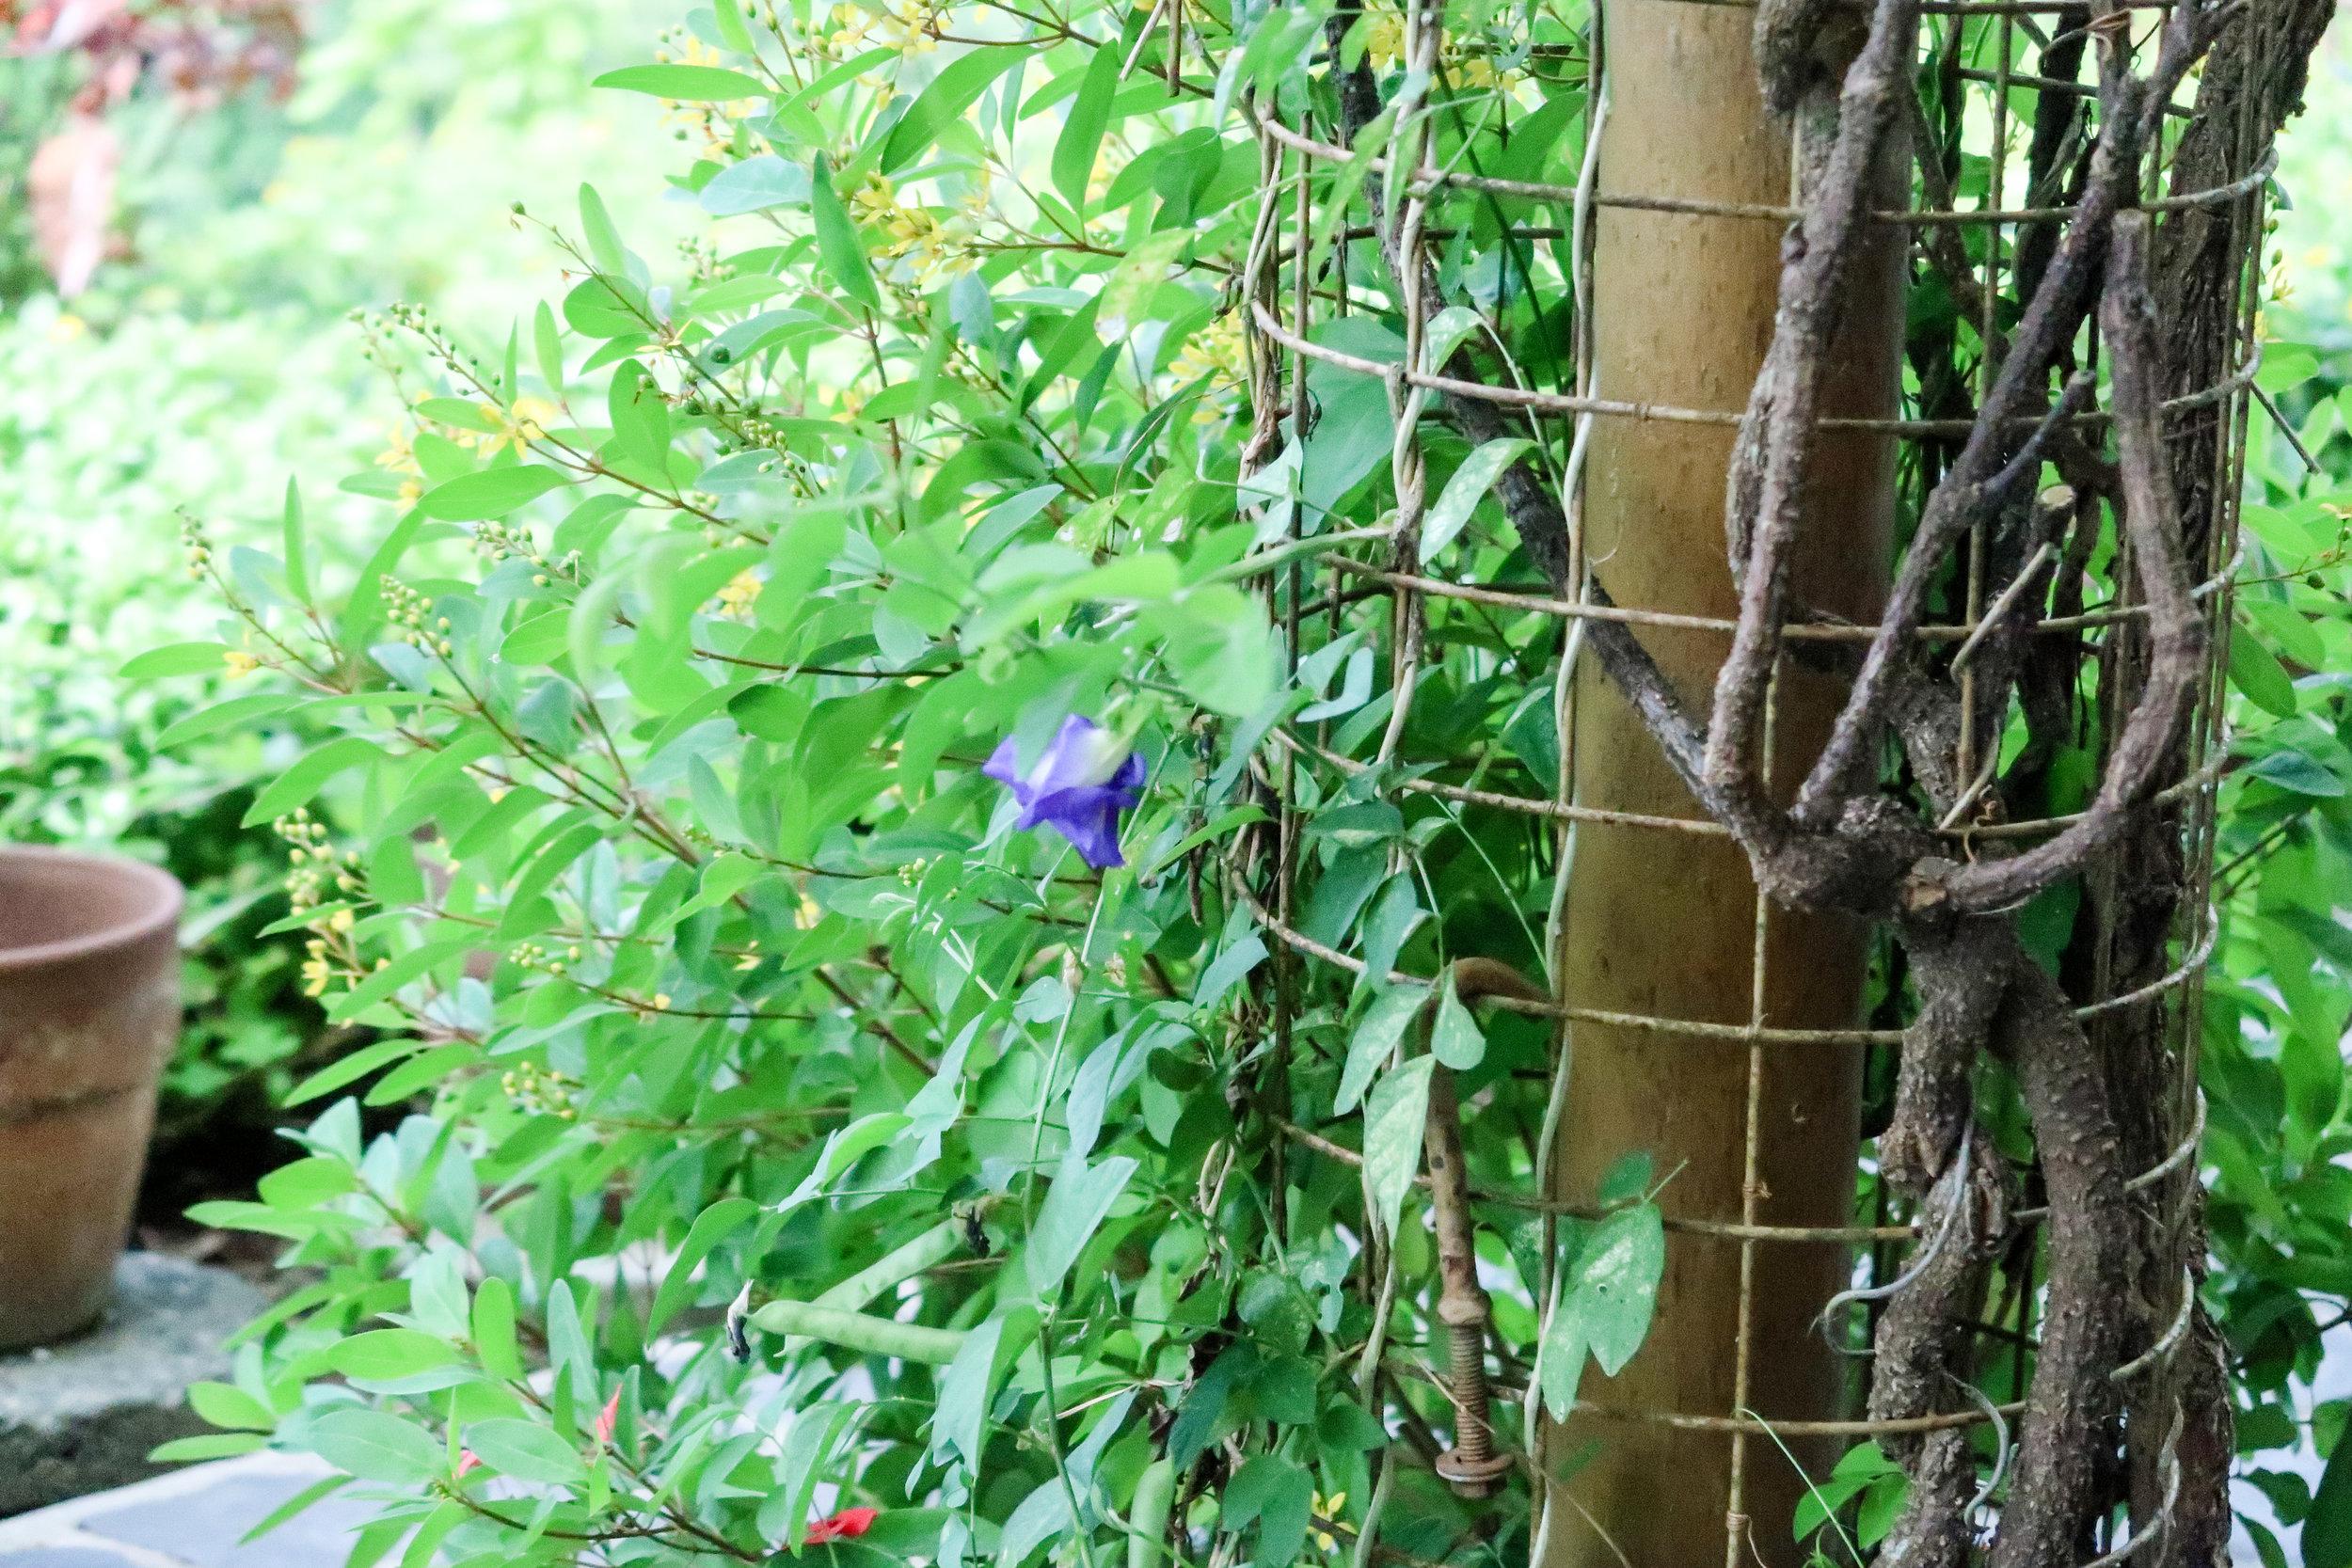 Blue flower for your iced tea